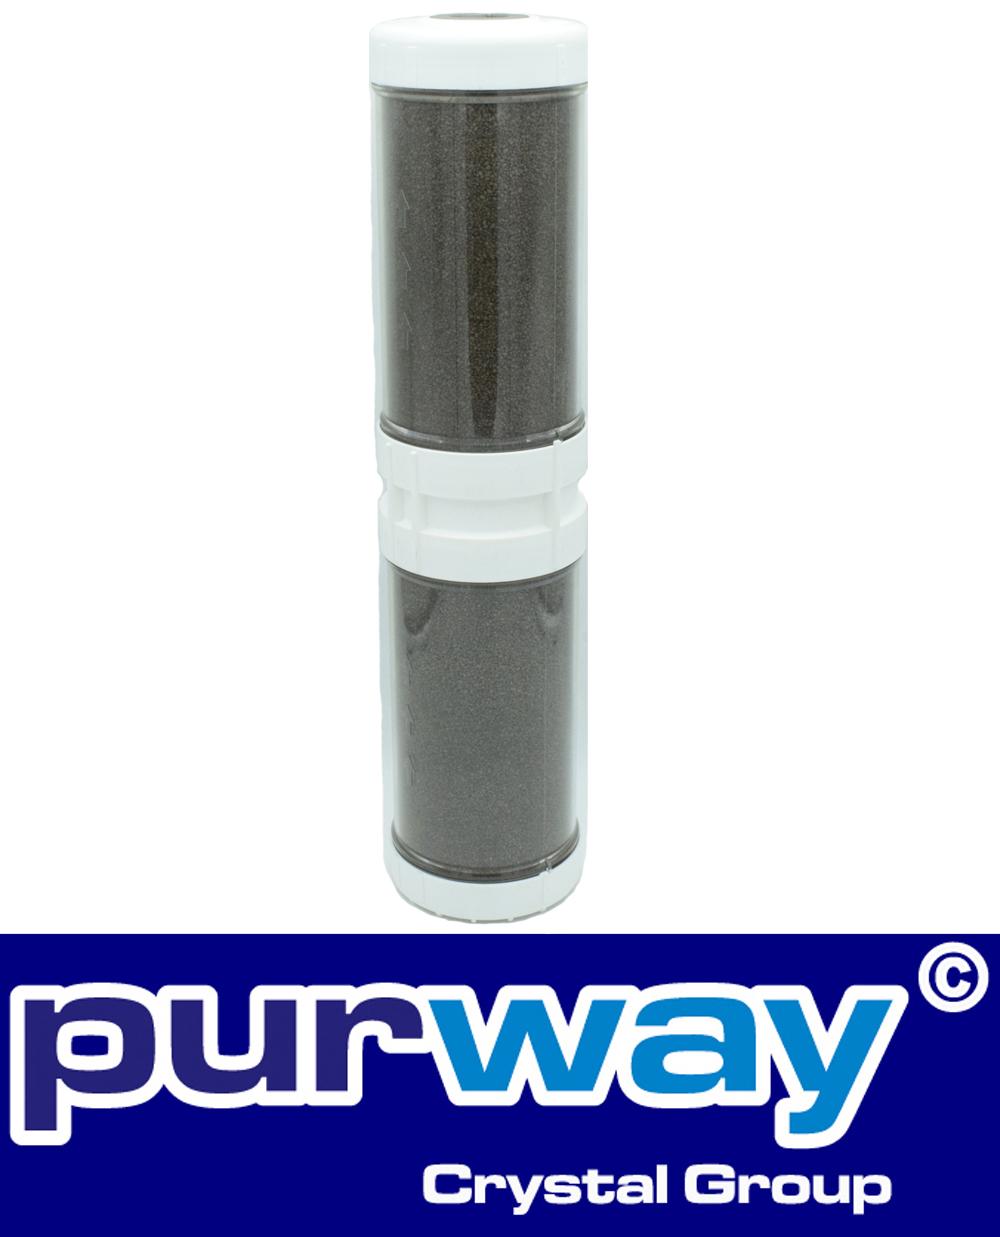 PFEX 20BB - 20 Zoll BIG Eisenfilter Patrone Brunnenwasserfilter